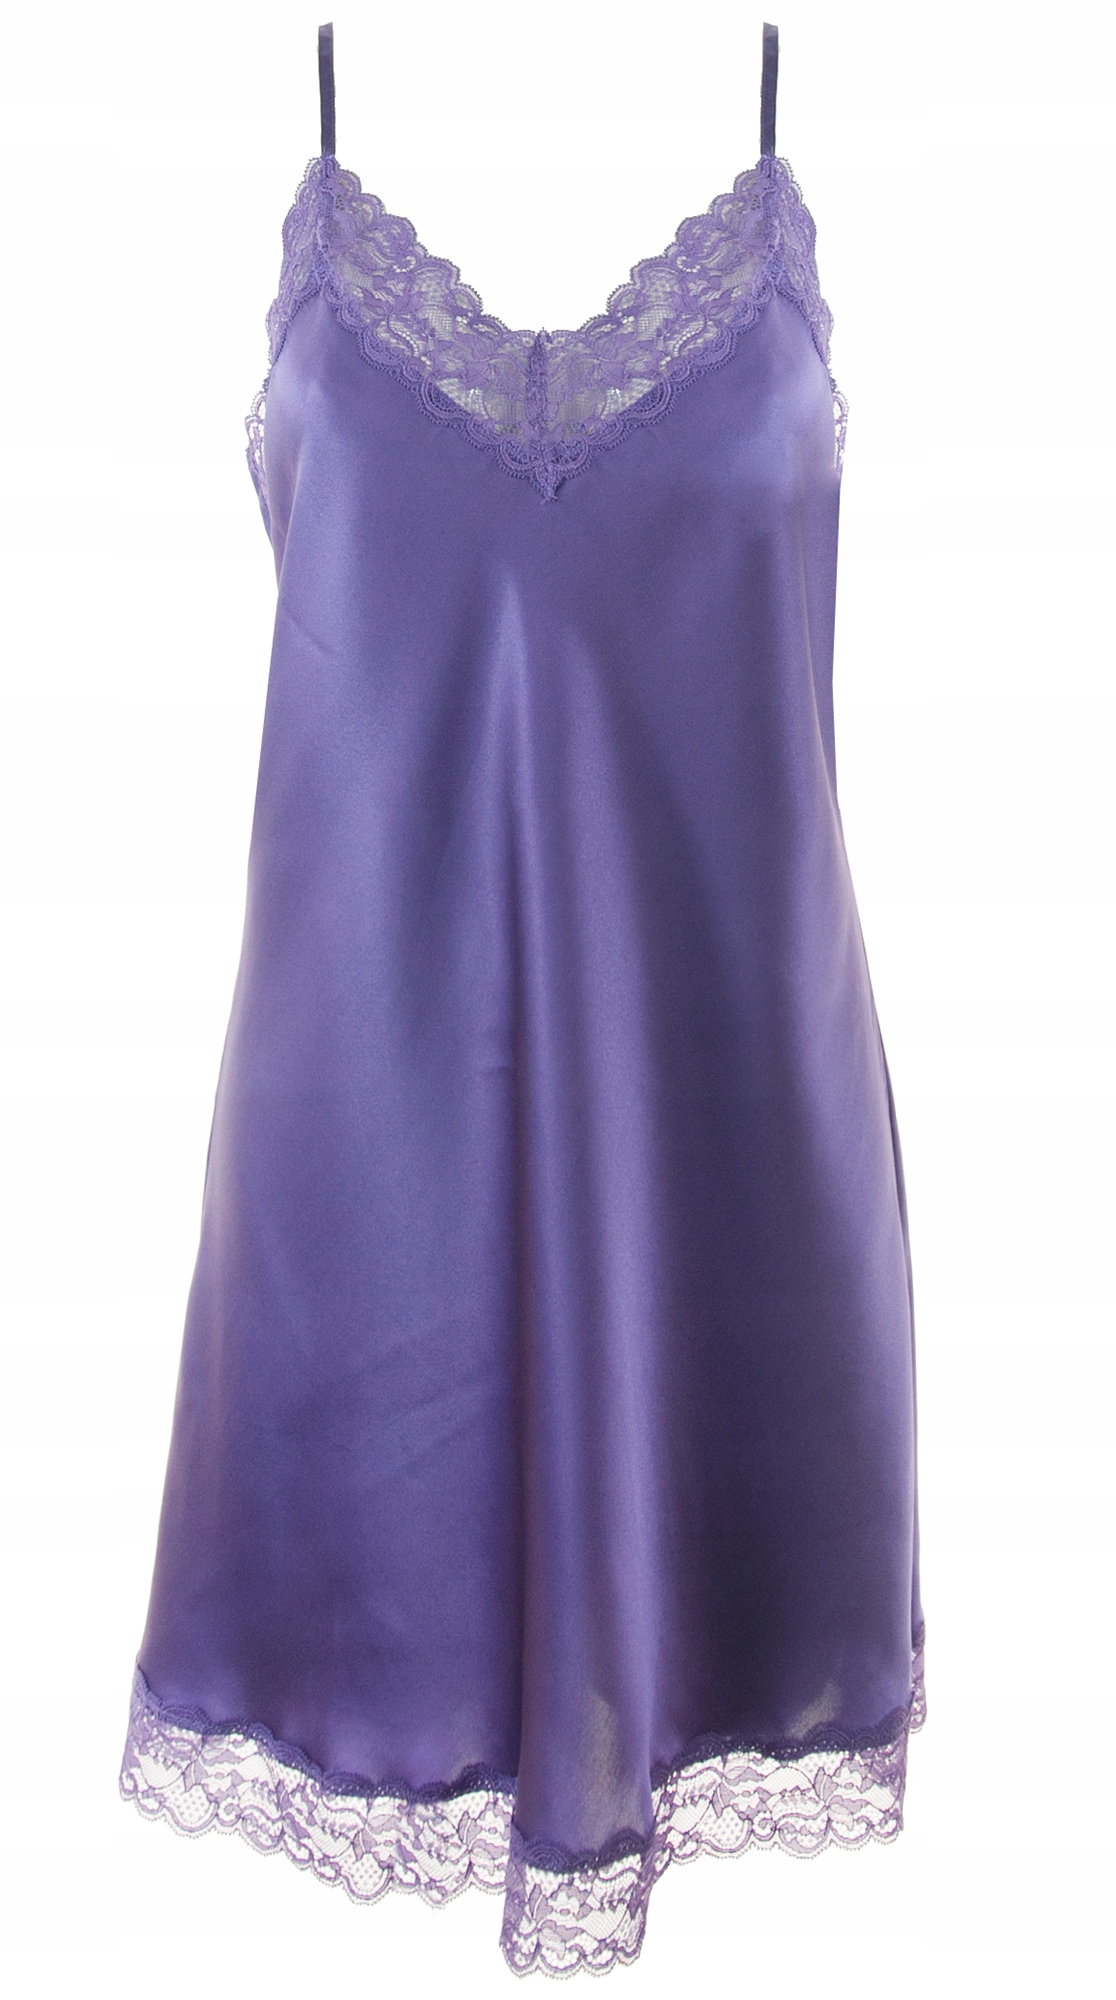 Intimissimi koszula nocna fioletowa jedwab M